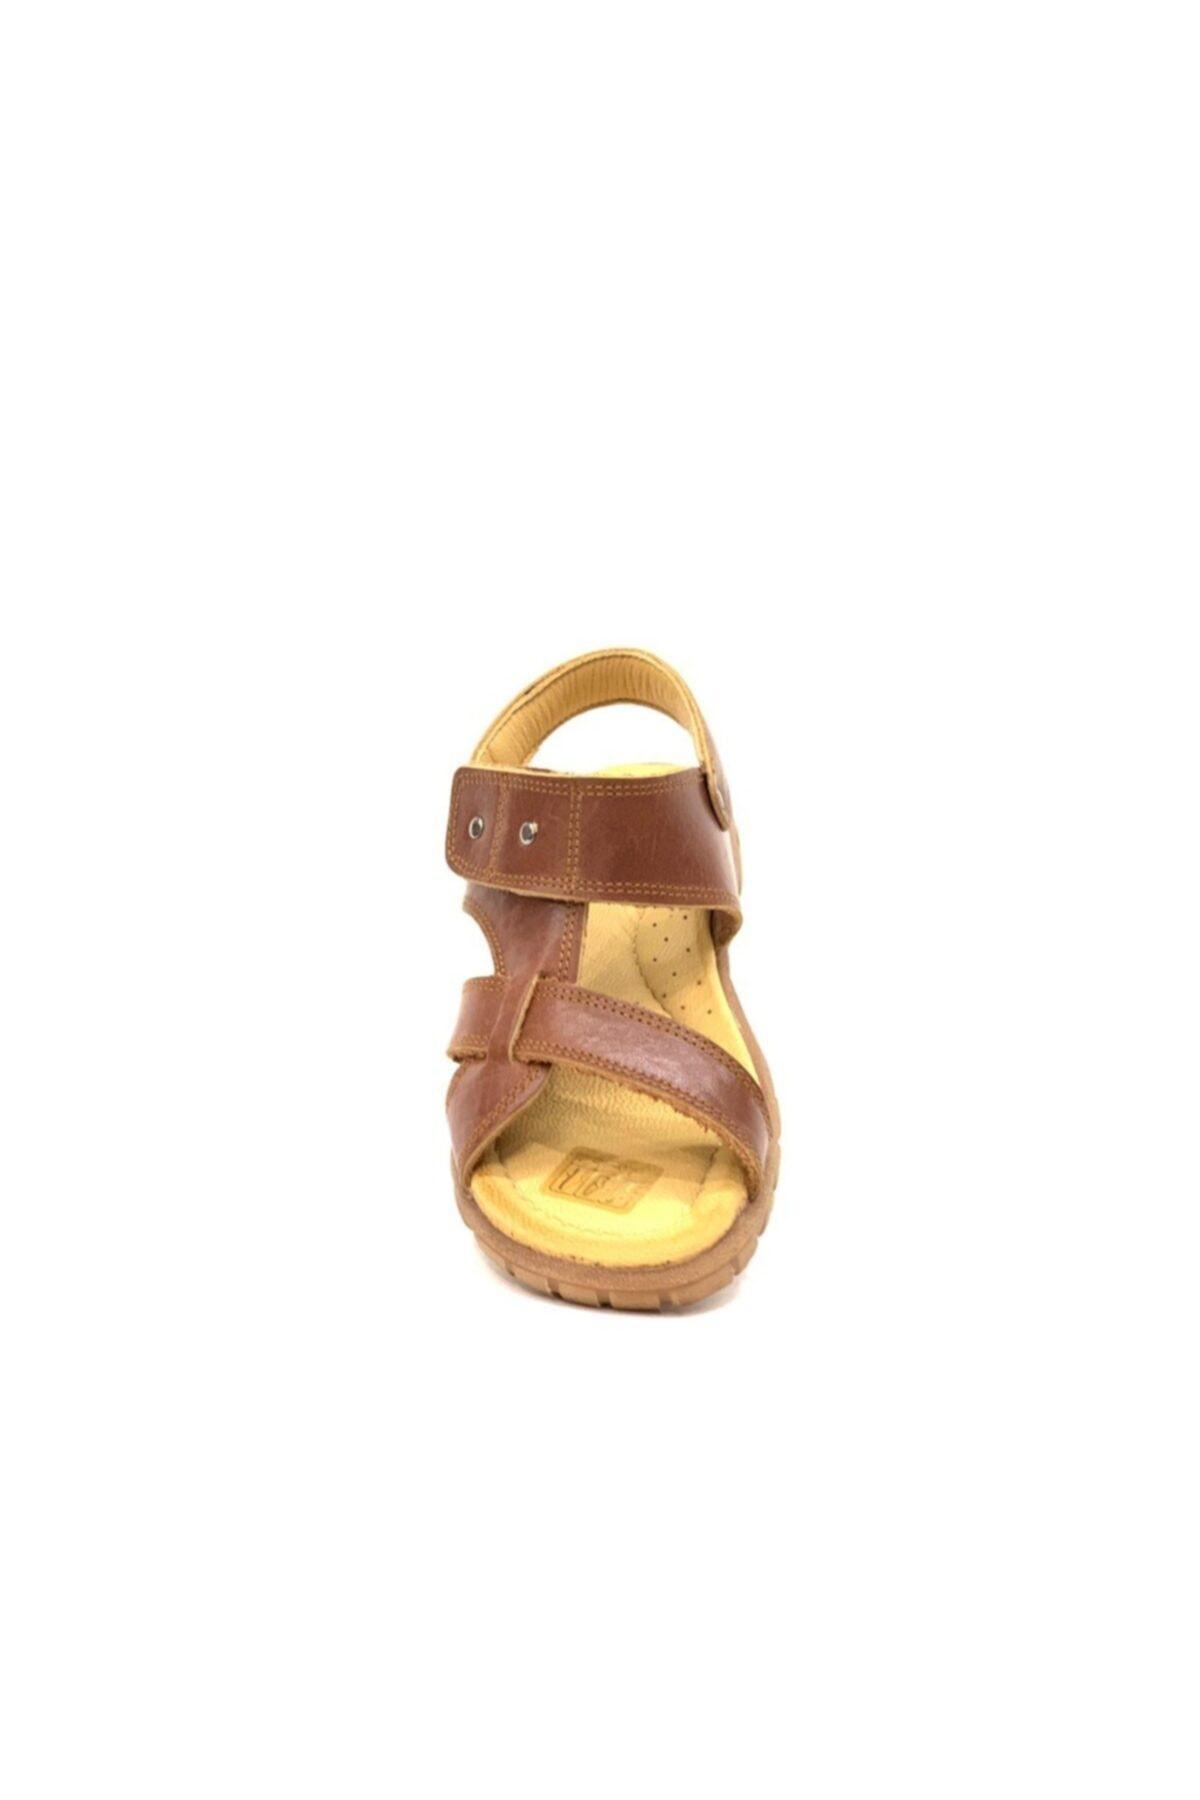 Toddler Erkek Çocuk Kahverengi Hakiki Deri Sandalet 2356 2